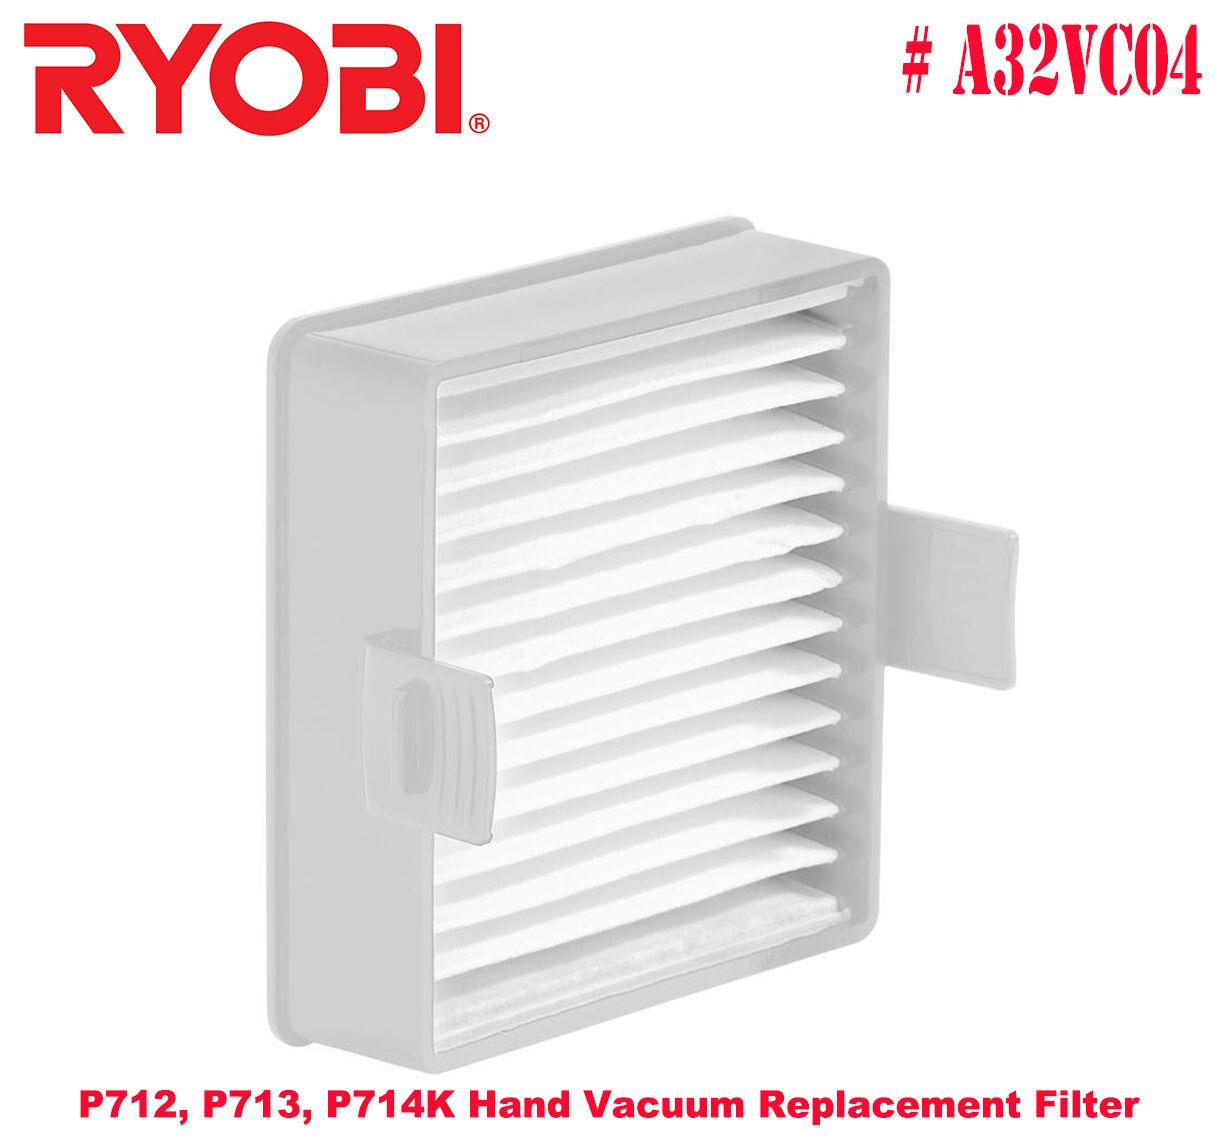 Ryobi # A32VC04 Hand Vacuum Replacement Filter for Ryobi P71